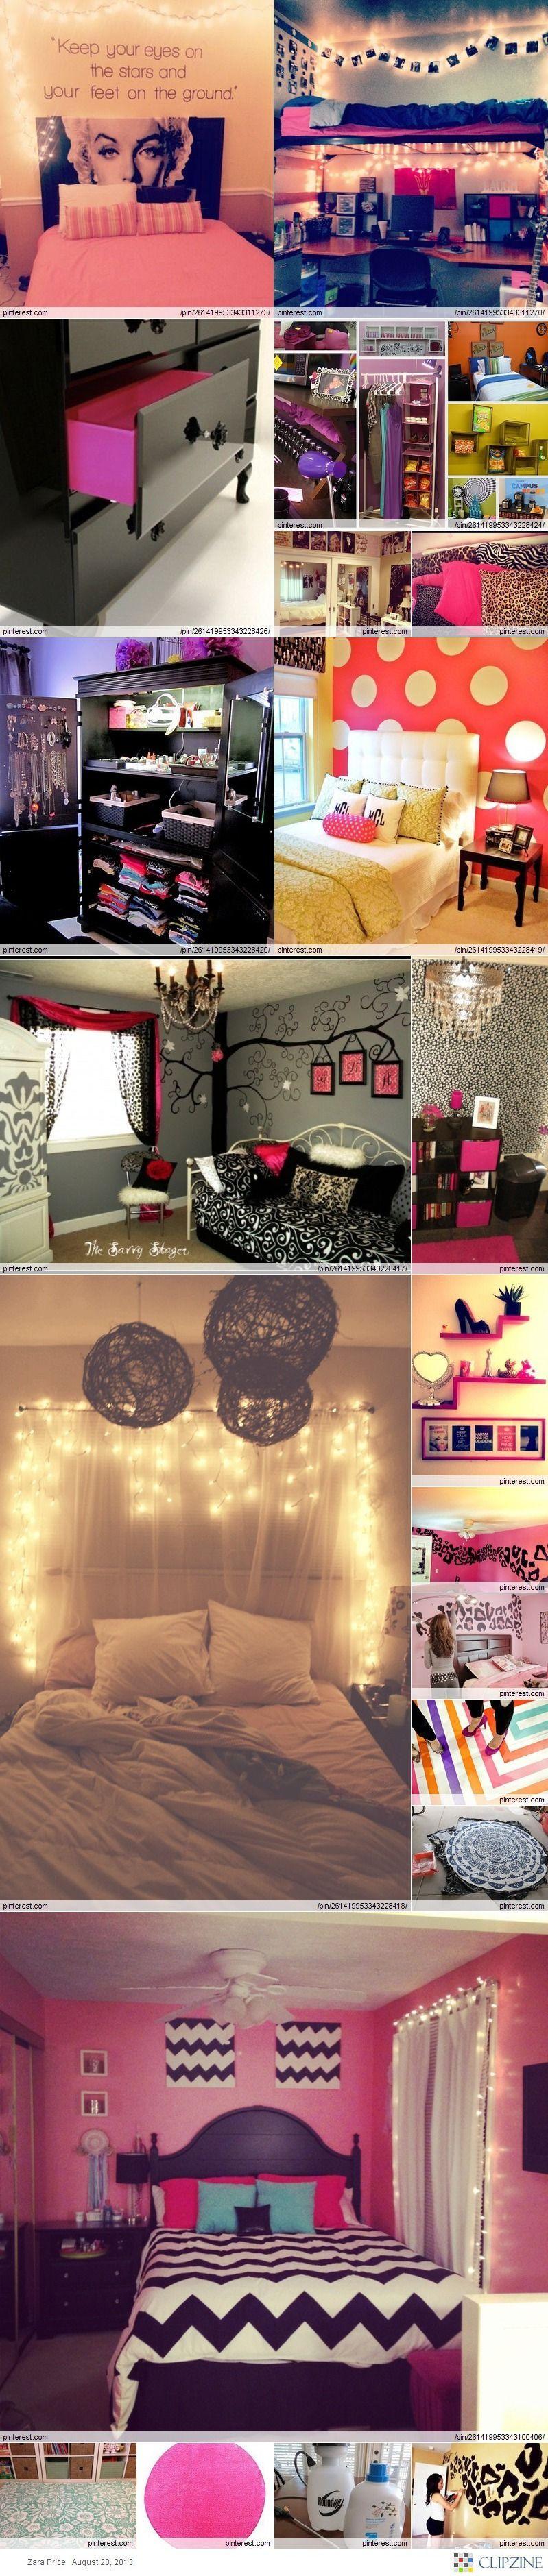 Room · My New Room Ideas